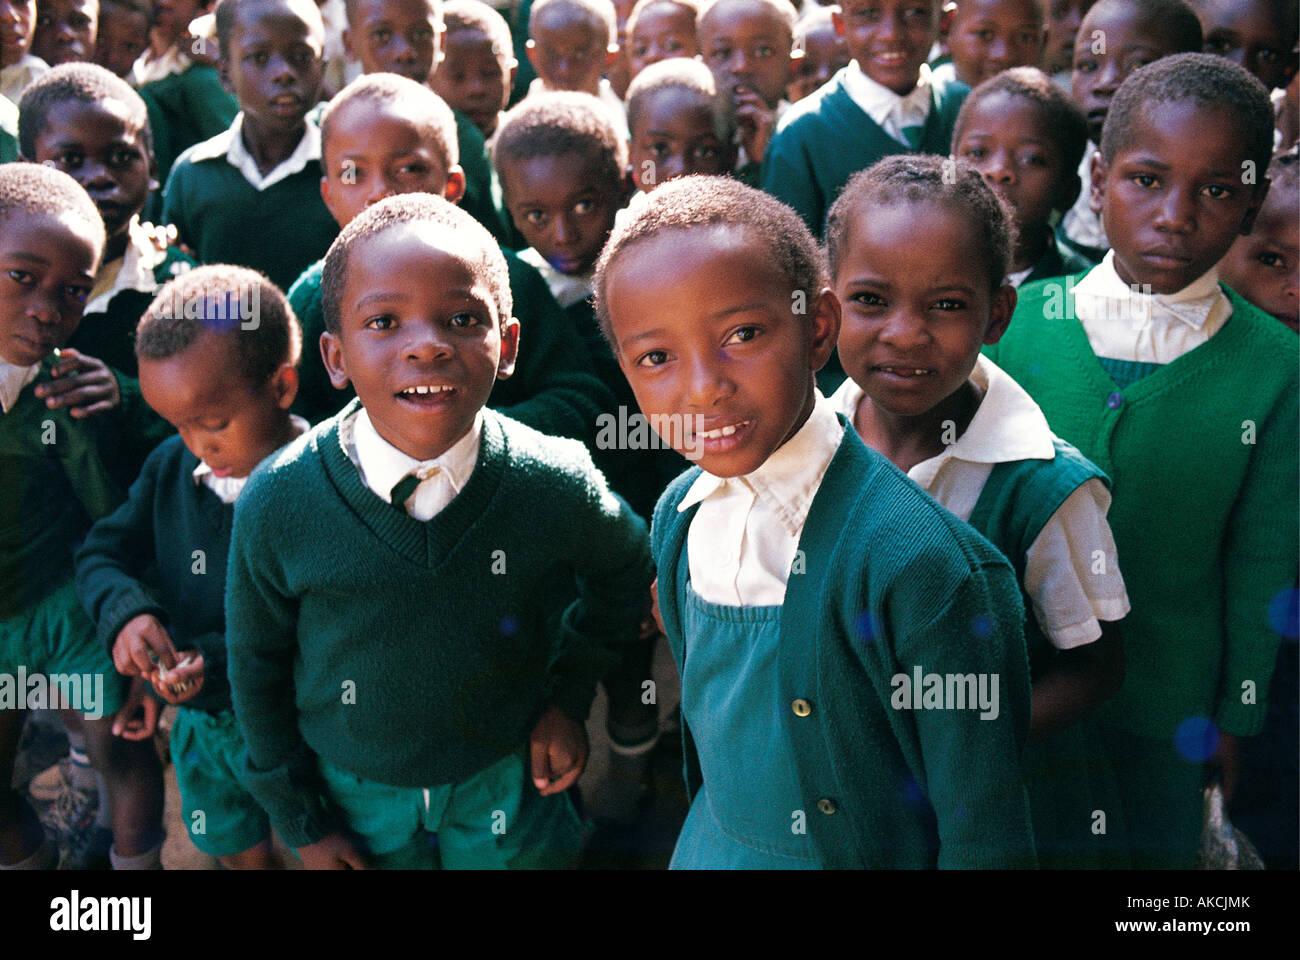 A large group of Primary School children dressed in green school uniforms in Nairobi Kenya East Africa - Stock Image